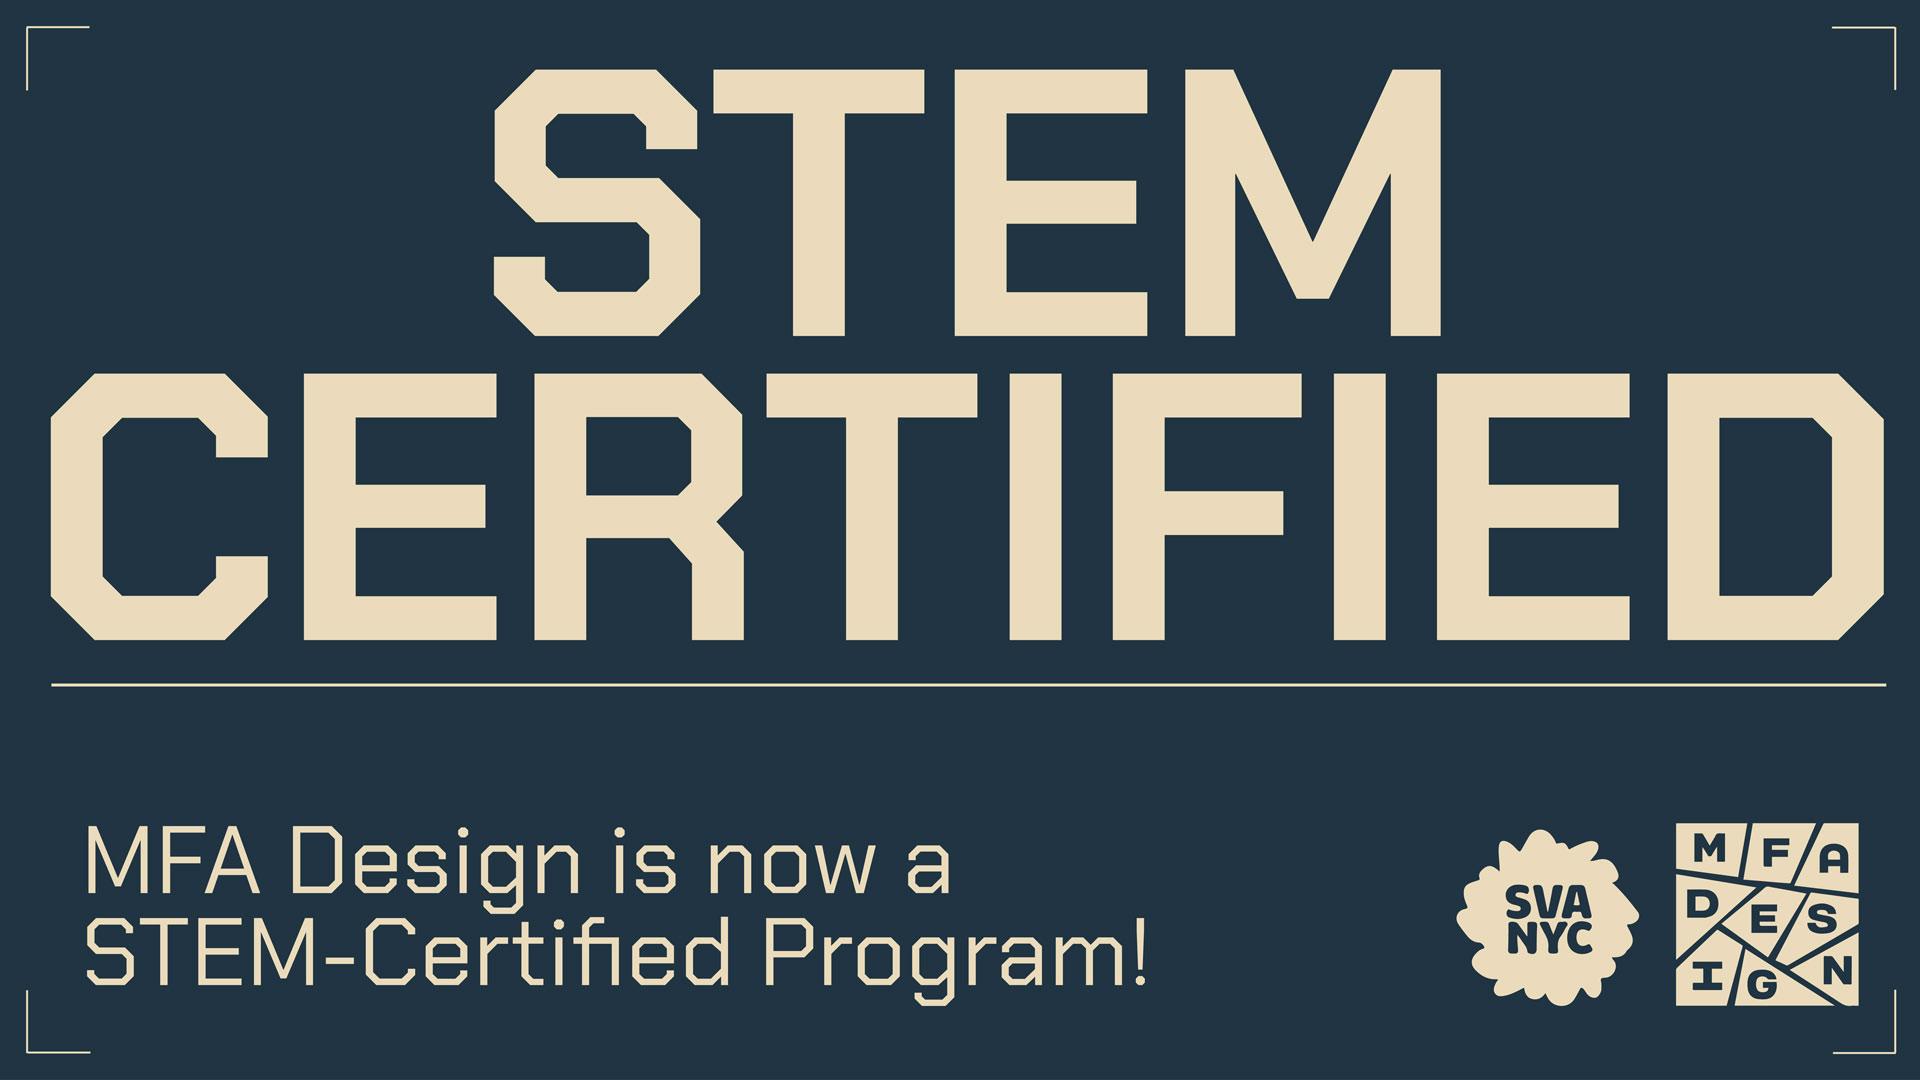 SVA MFA Design is STEM certified